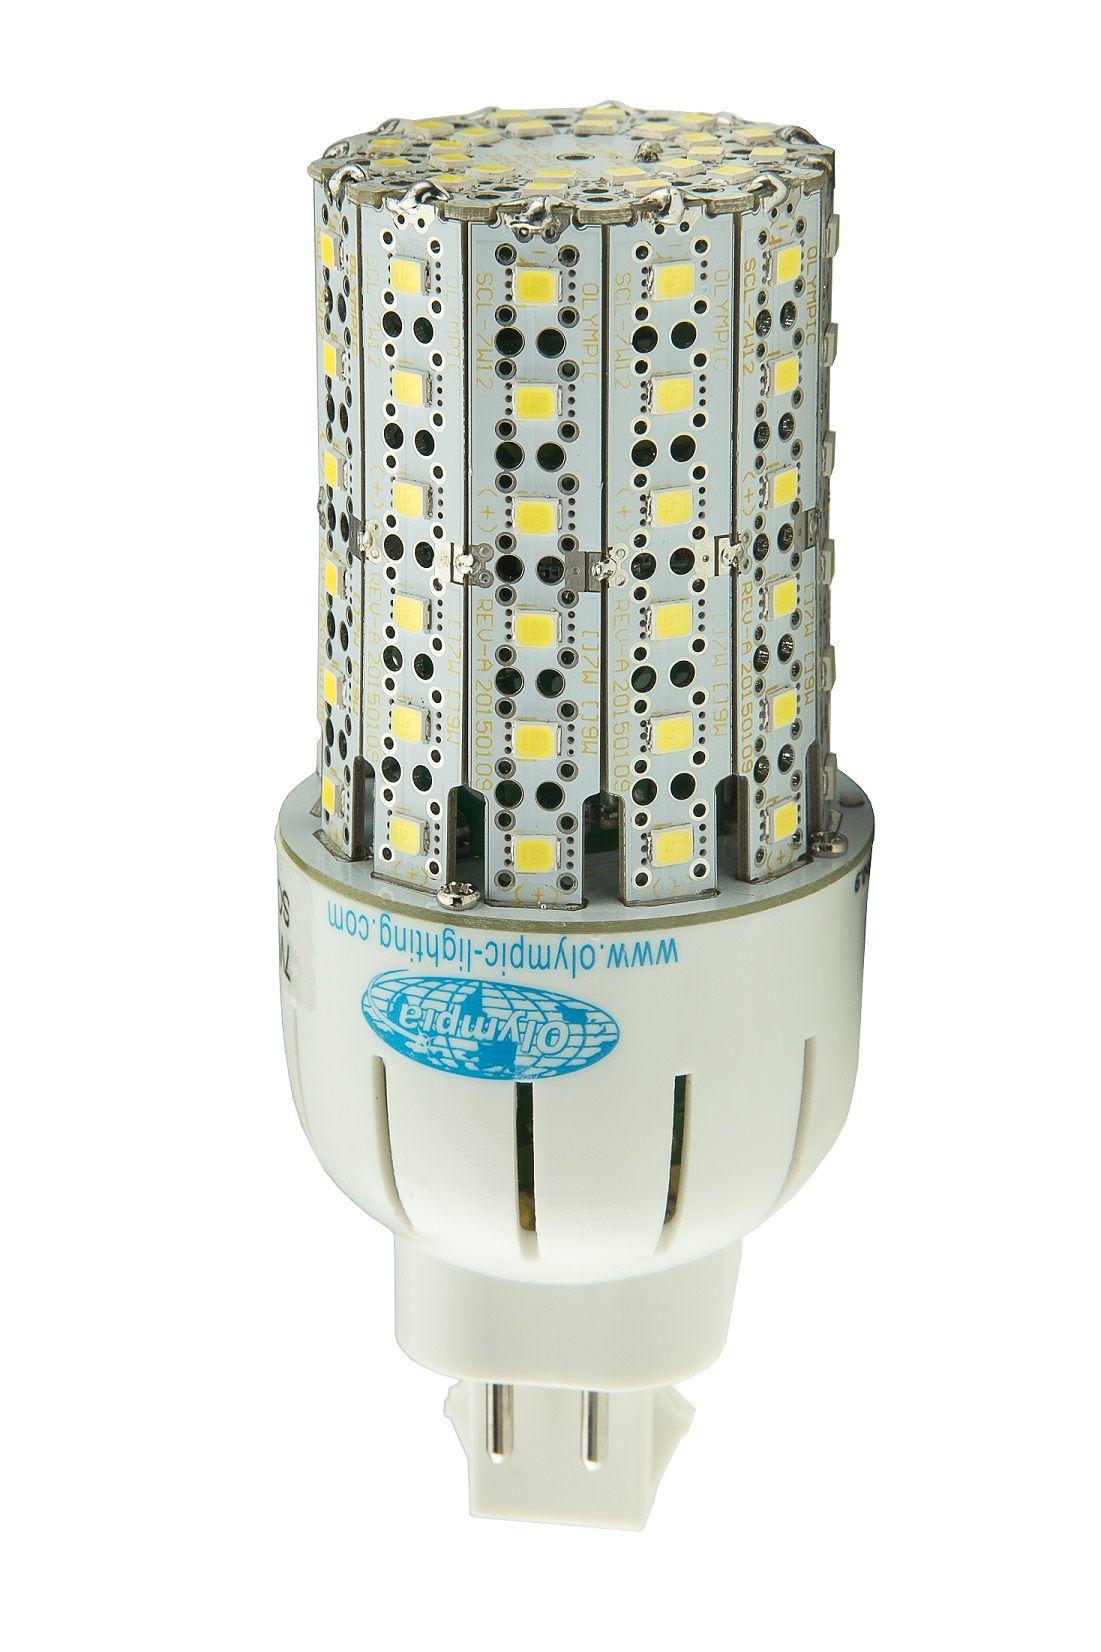 Colored 4 Watt Light Bulbs